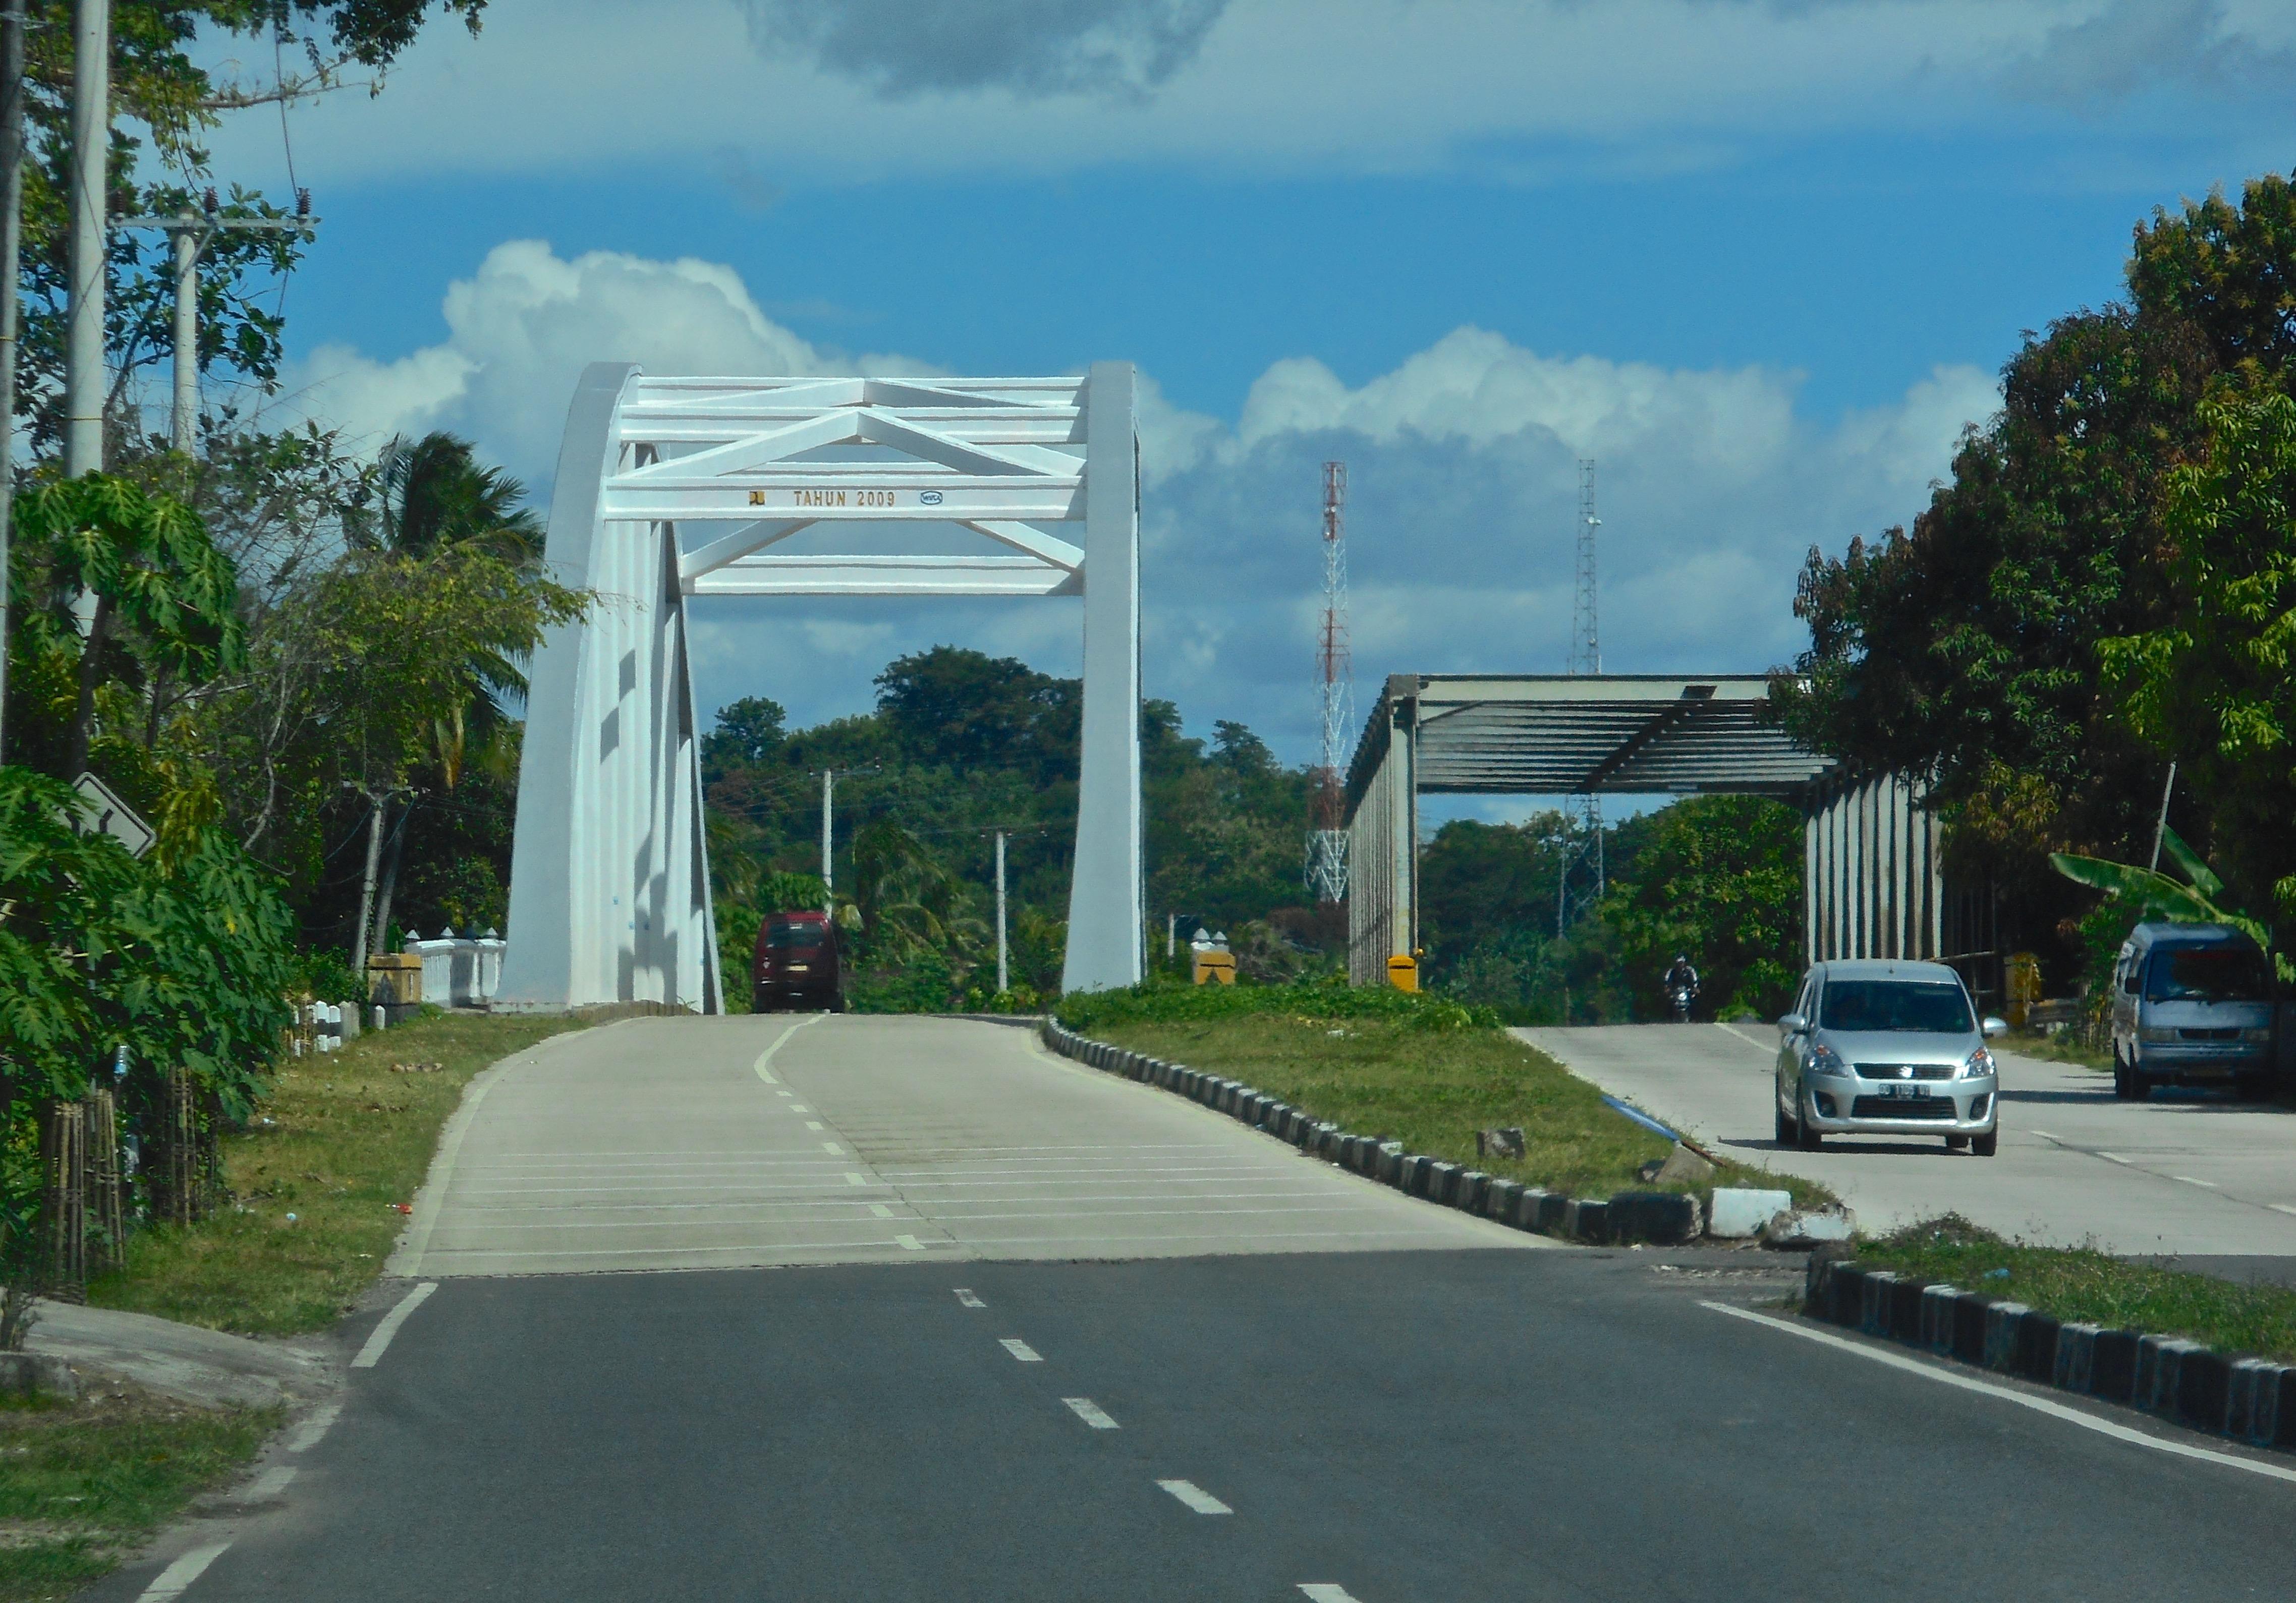 Indonesia Steel Bridges Project (image: Robert Cannon)